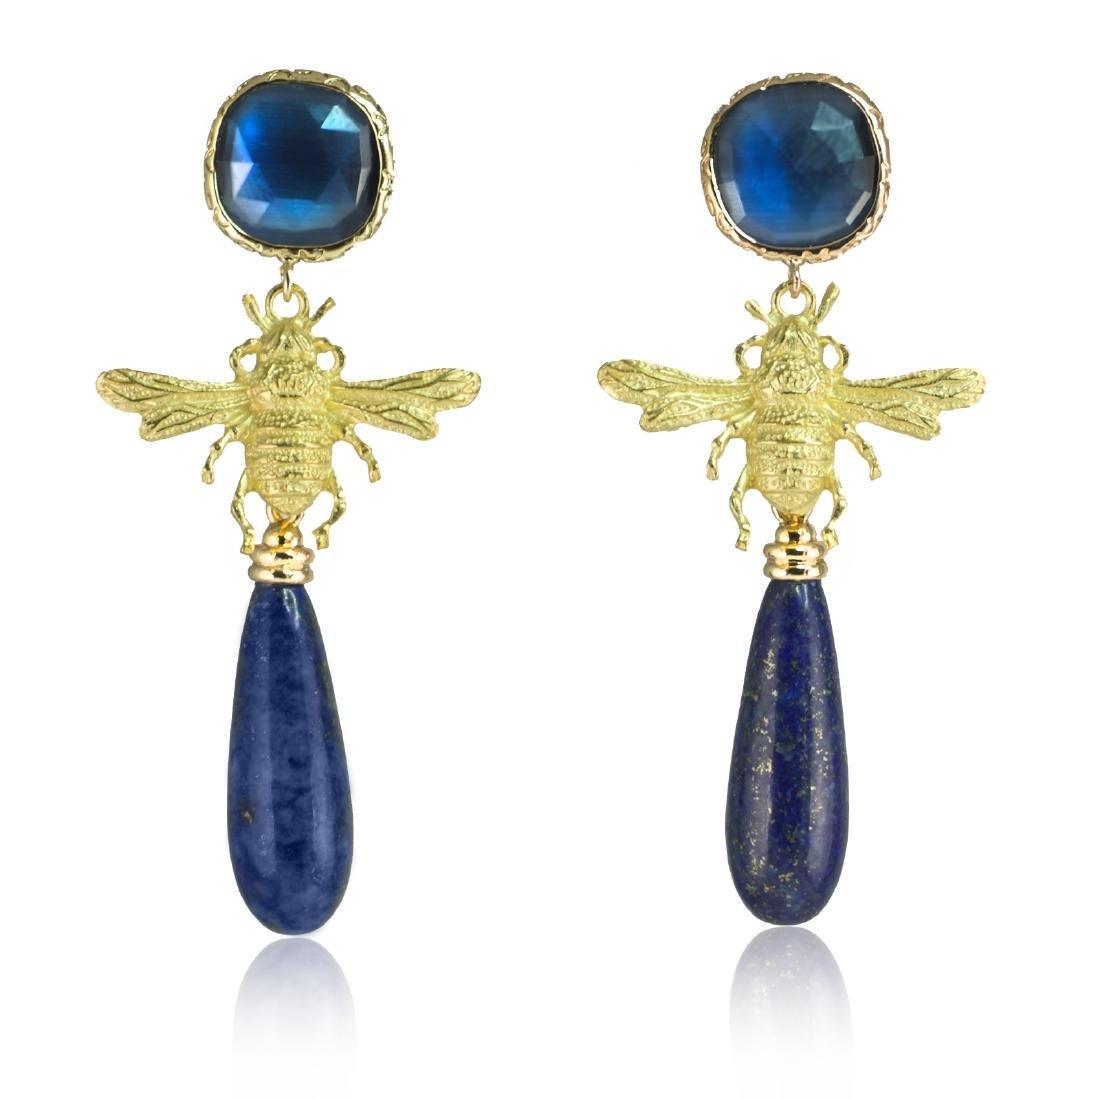 Lapis lazuli Fly Eye-catching Earrings